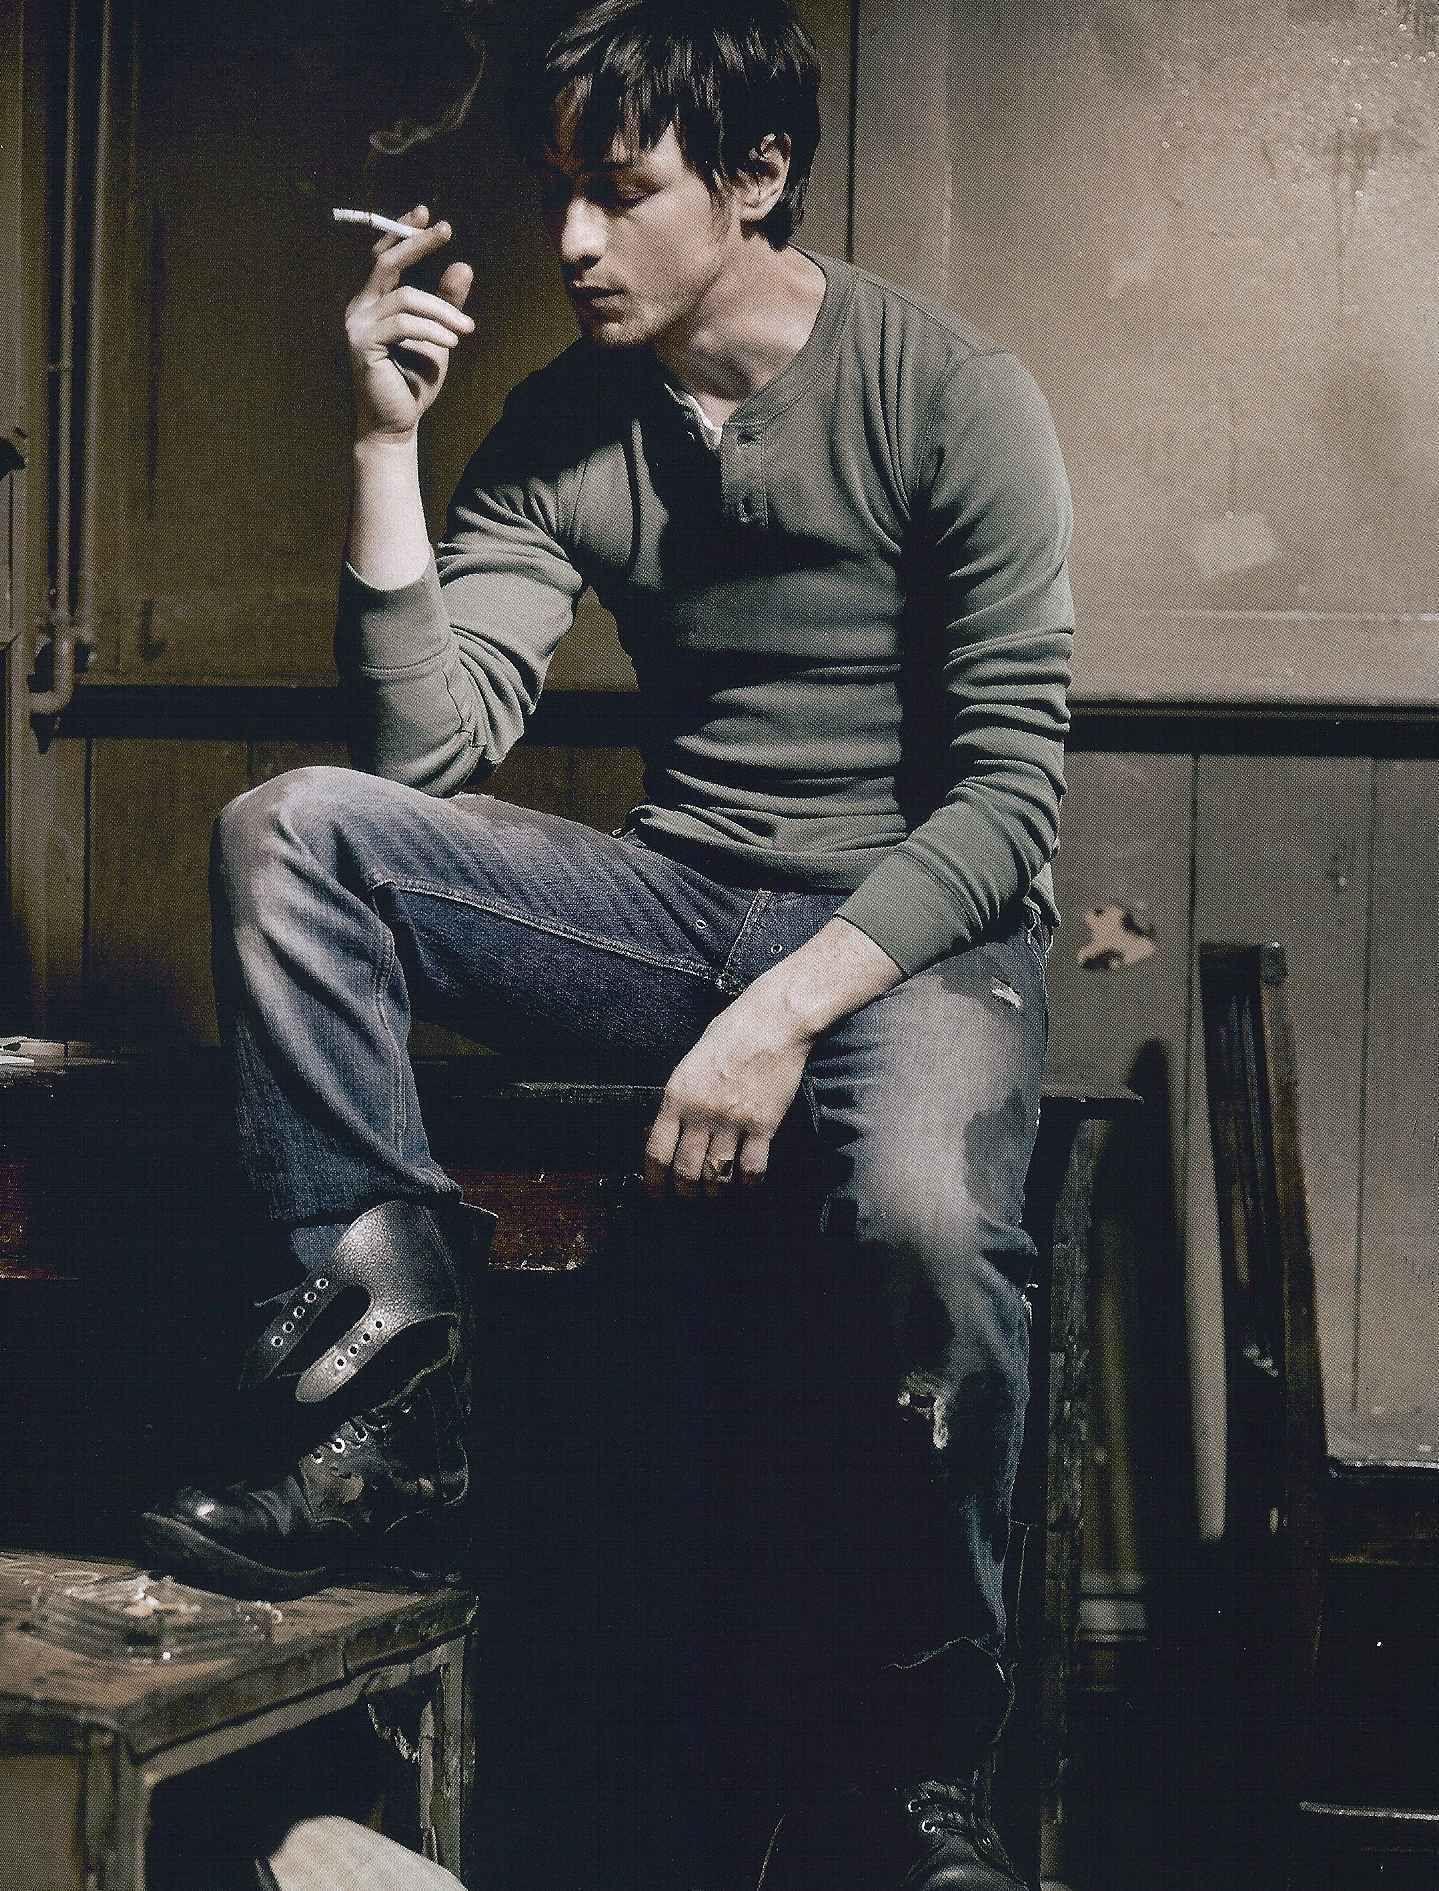 James McAvoy sigara içerken (veya esrar)